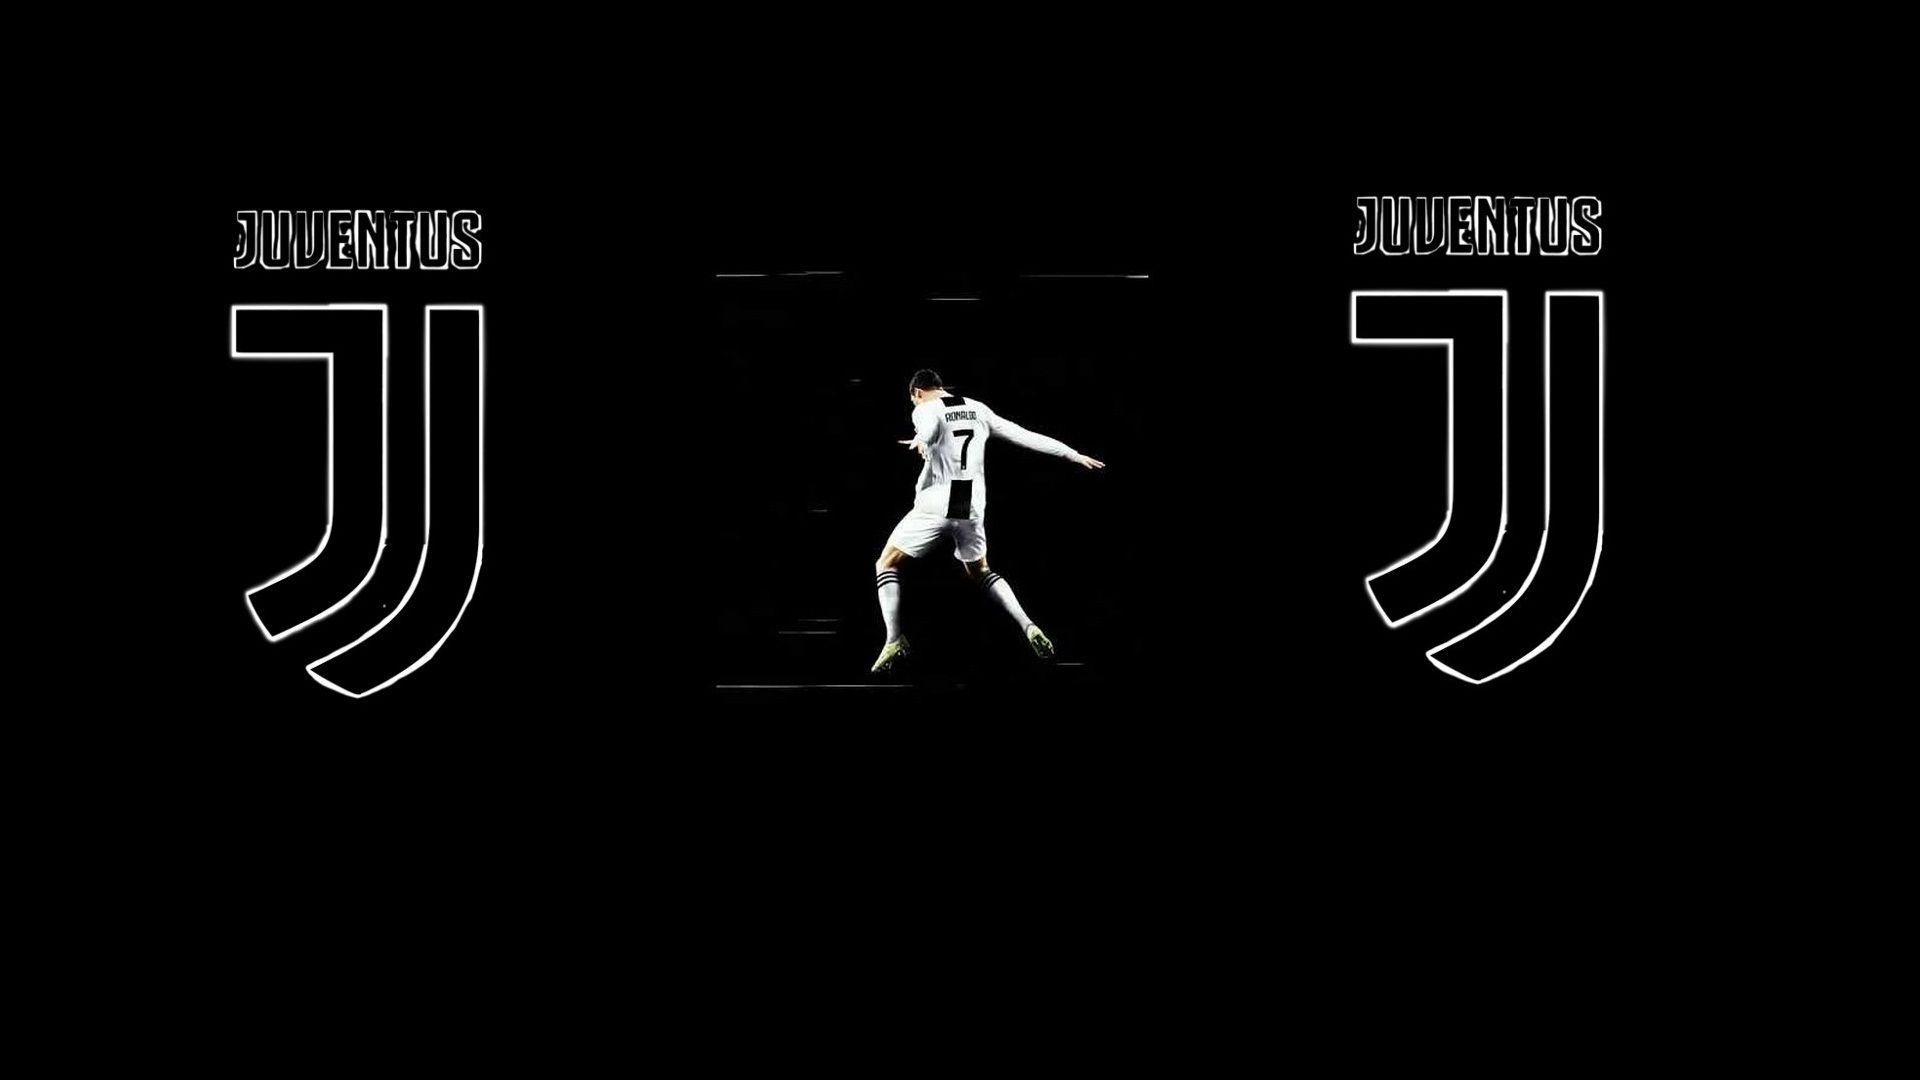 Cristiano Ronaldo Juventus Wallpaper For Desktop Best Wallpaper Hd Juventus Wallpapers Cristiano Ronaldo Juventus Ronaldo Juventus